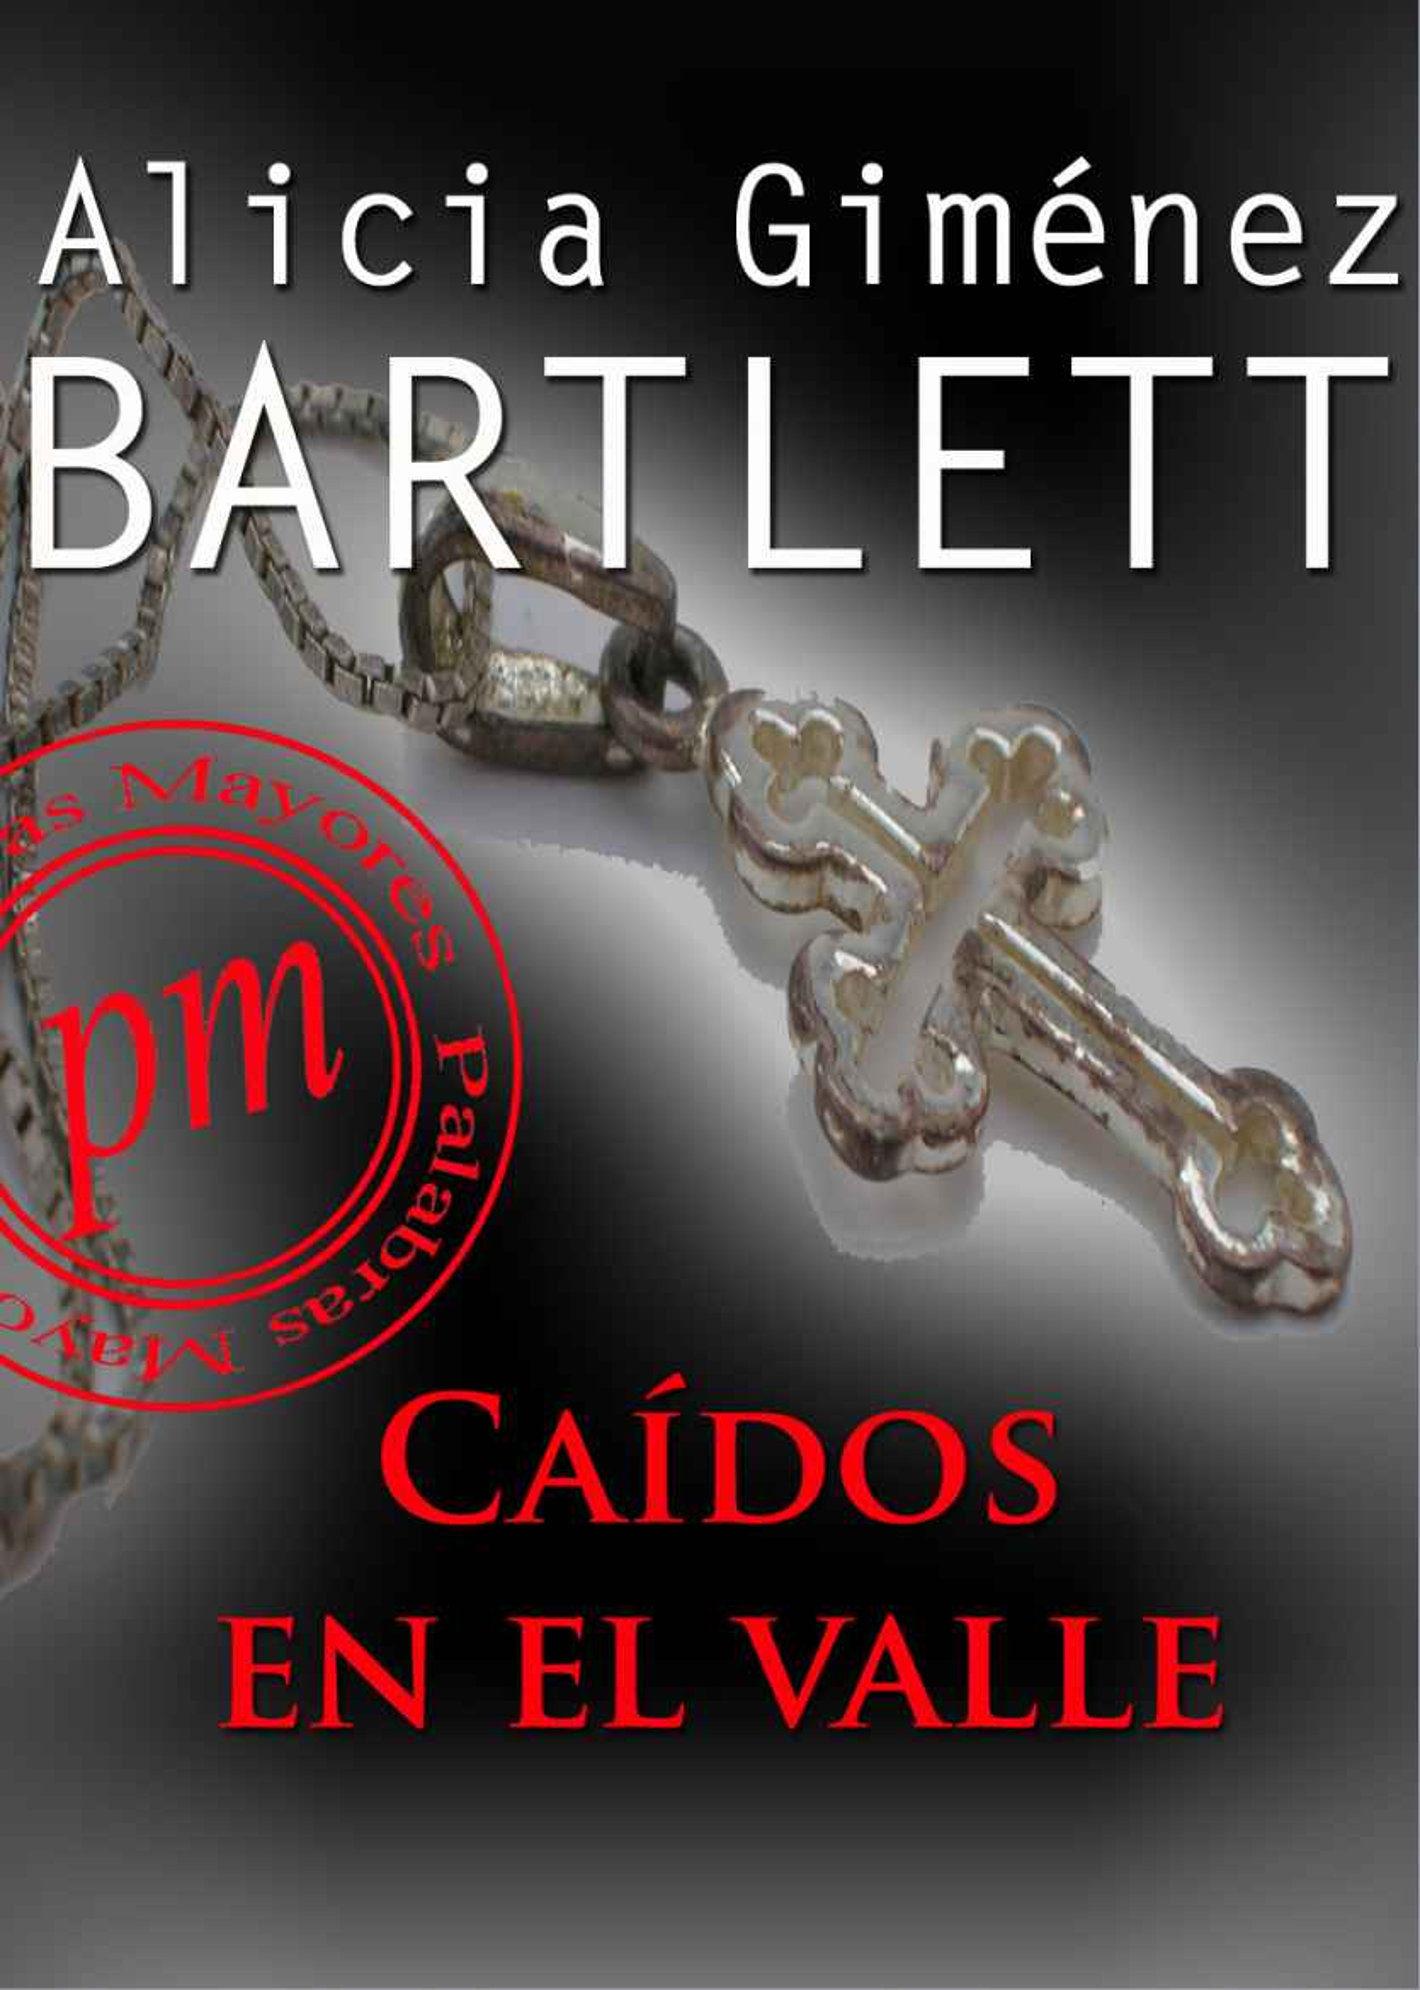 Alicia Gimenez Bartlett Ebook